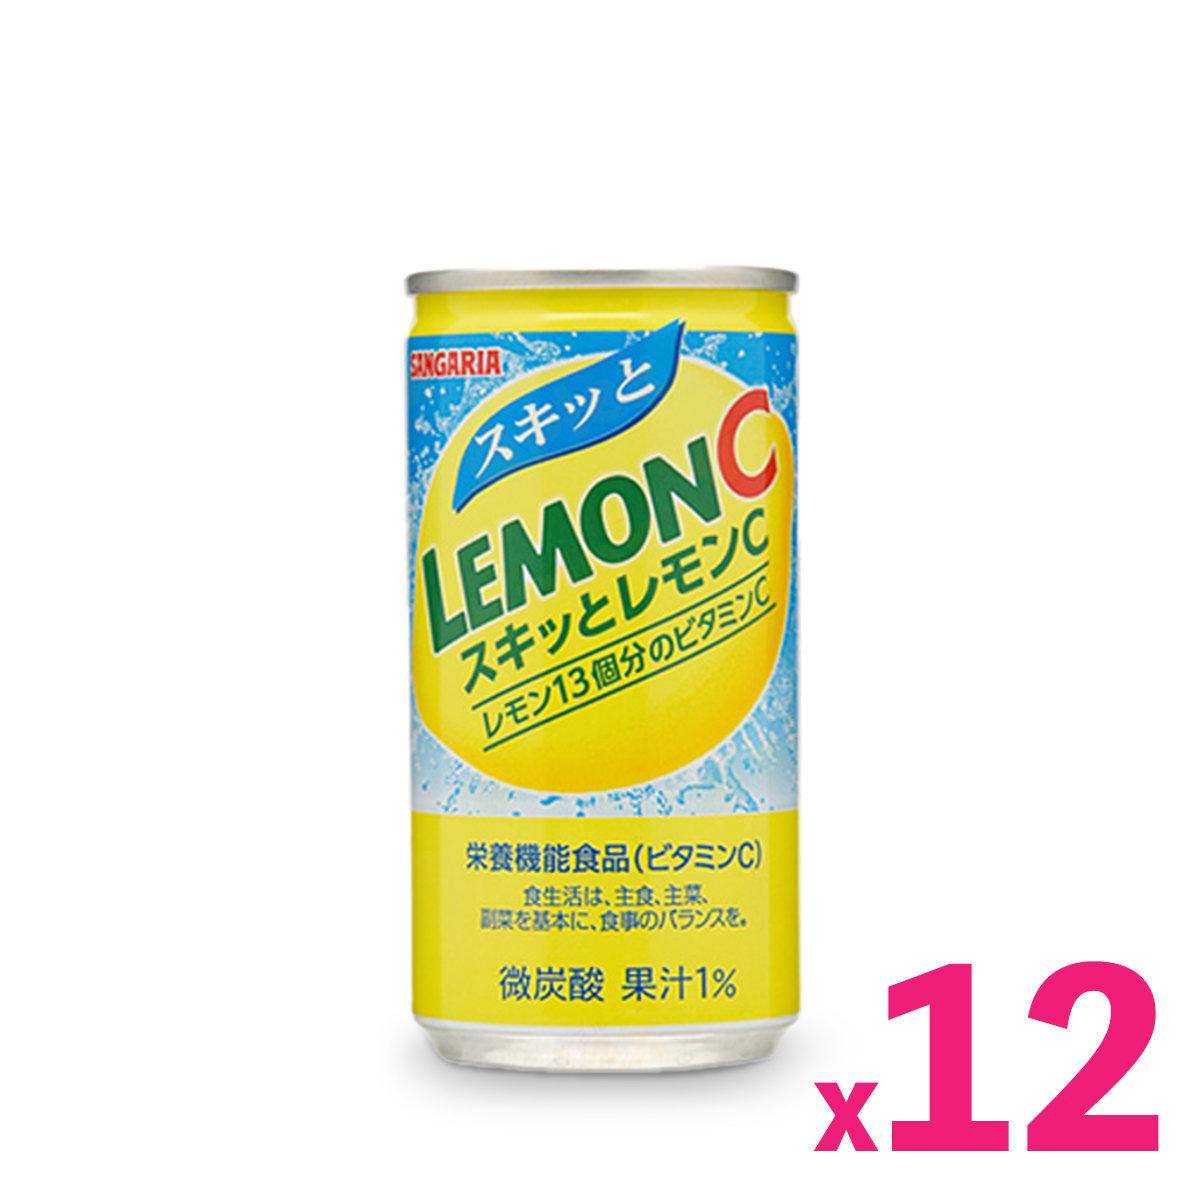 Japan Vitamin C Tonic Lemon Water (190ml) x 12